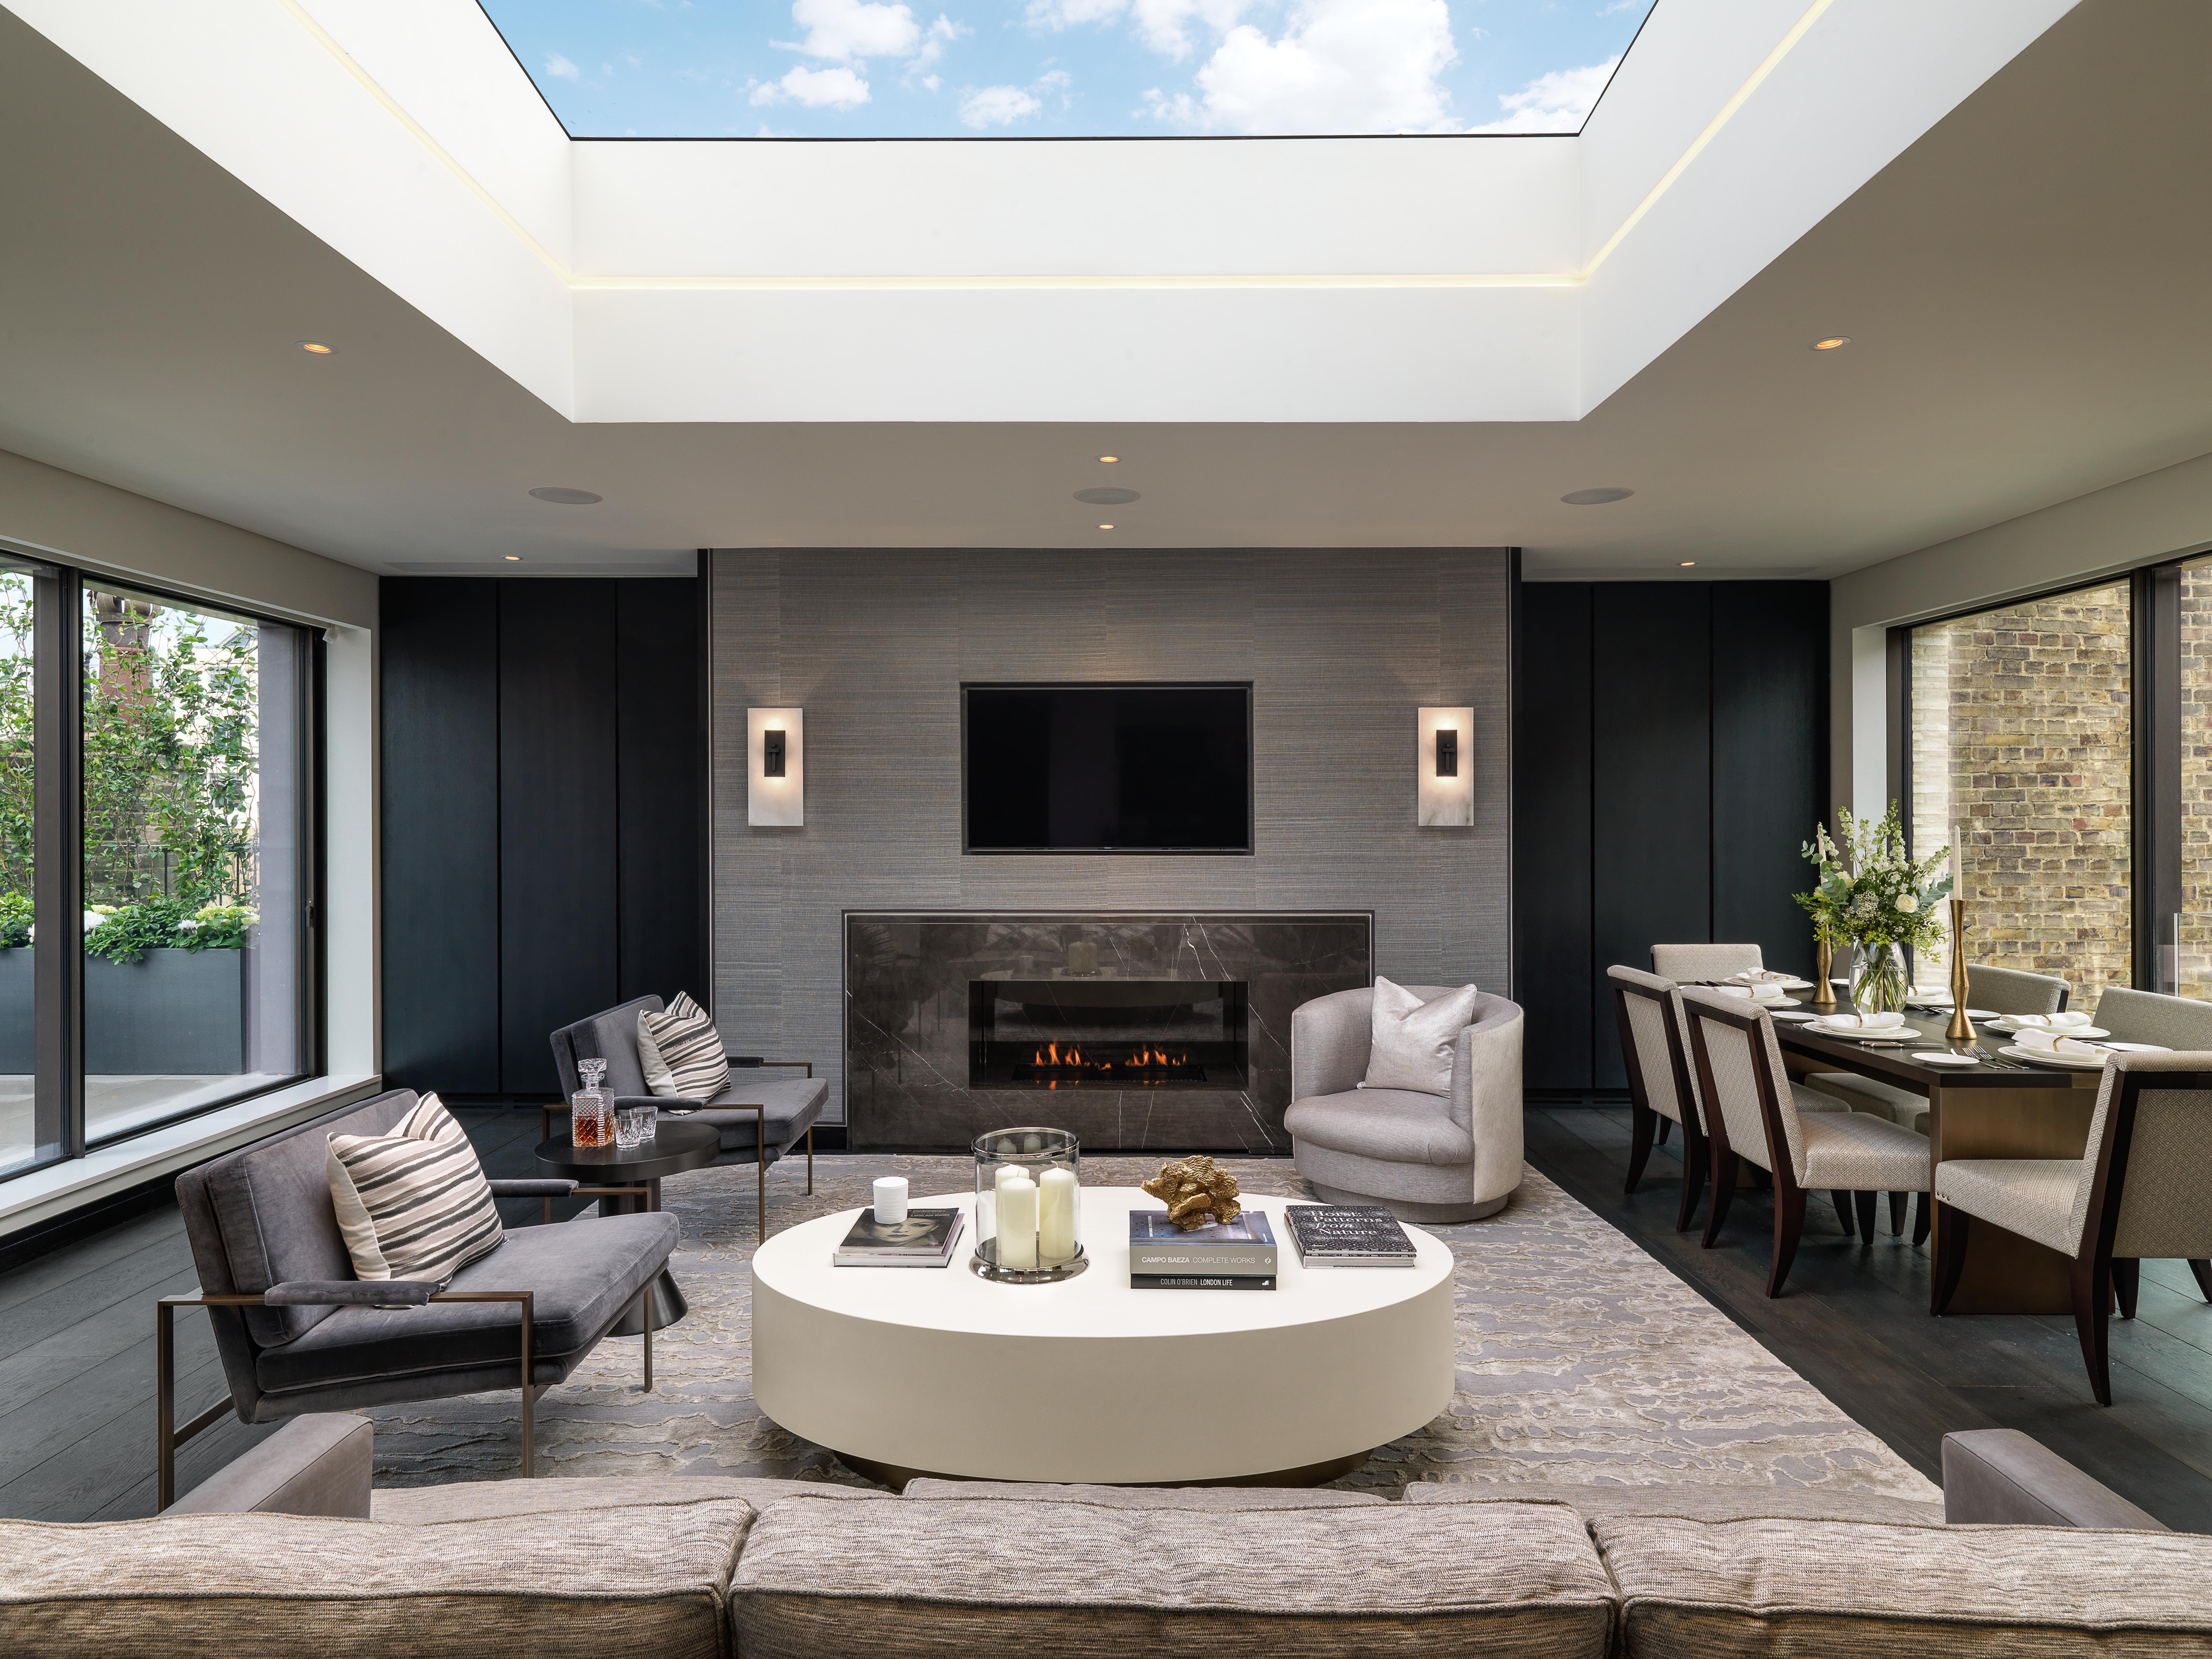 Knightsbridge luxury property development by Finchatton